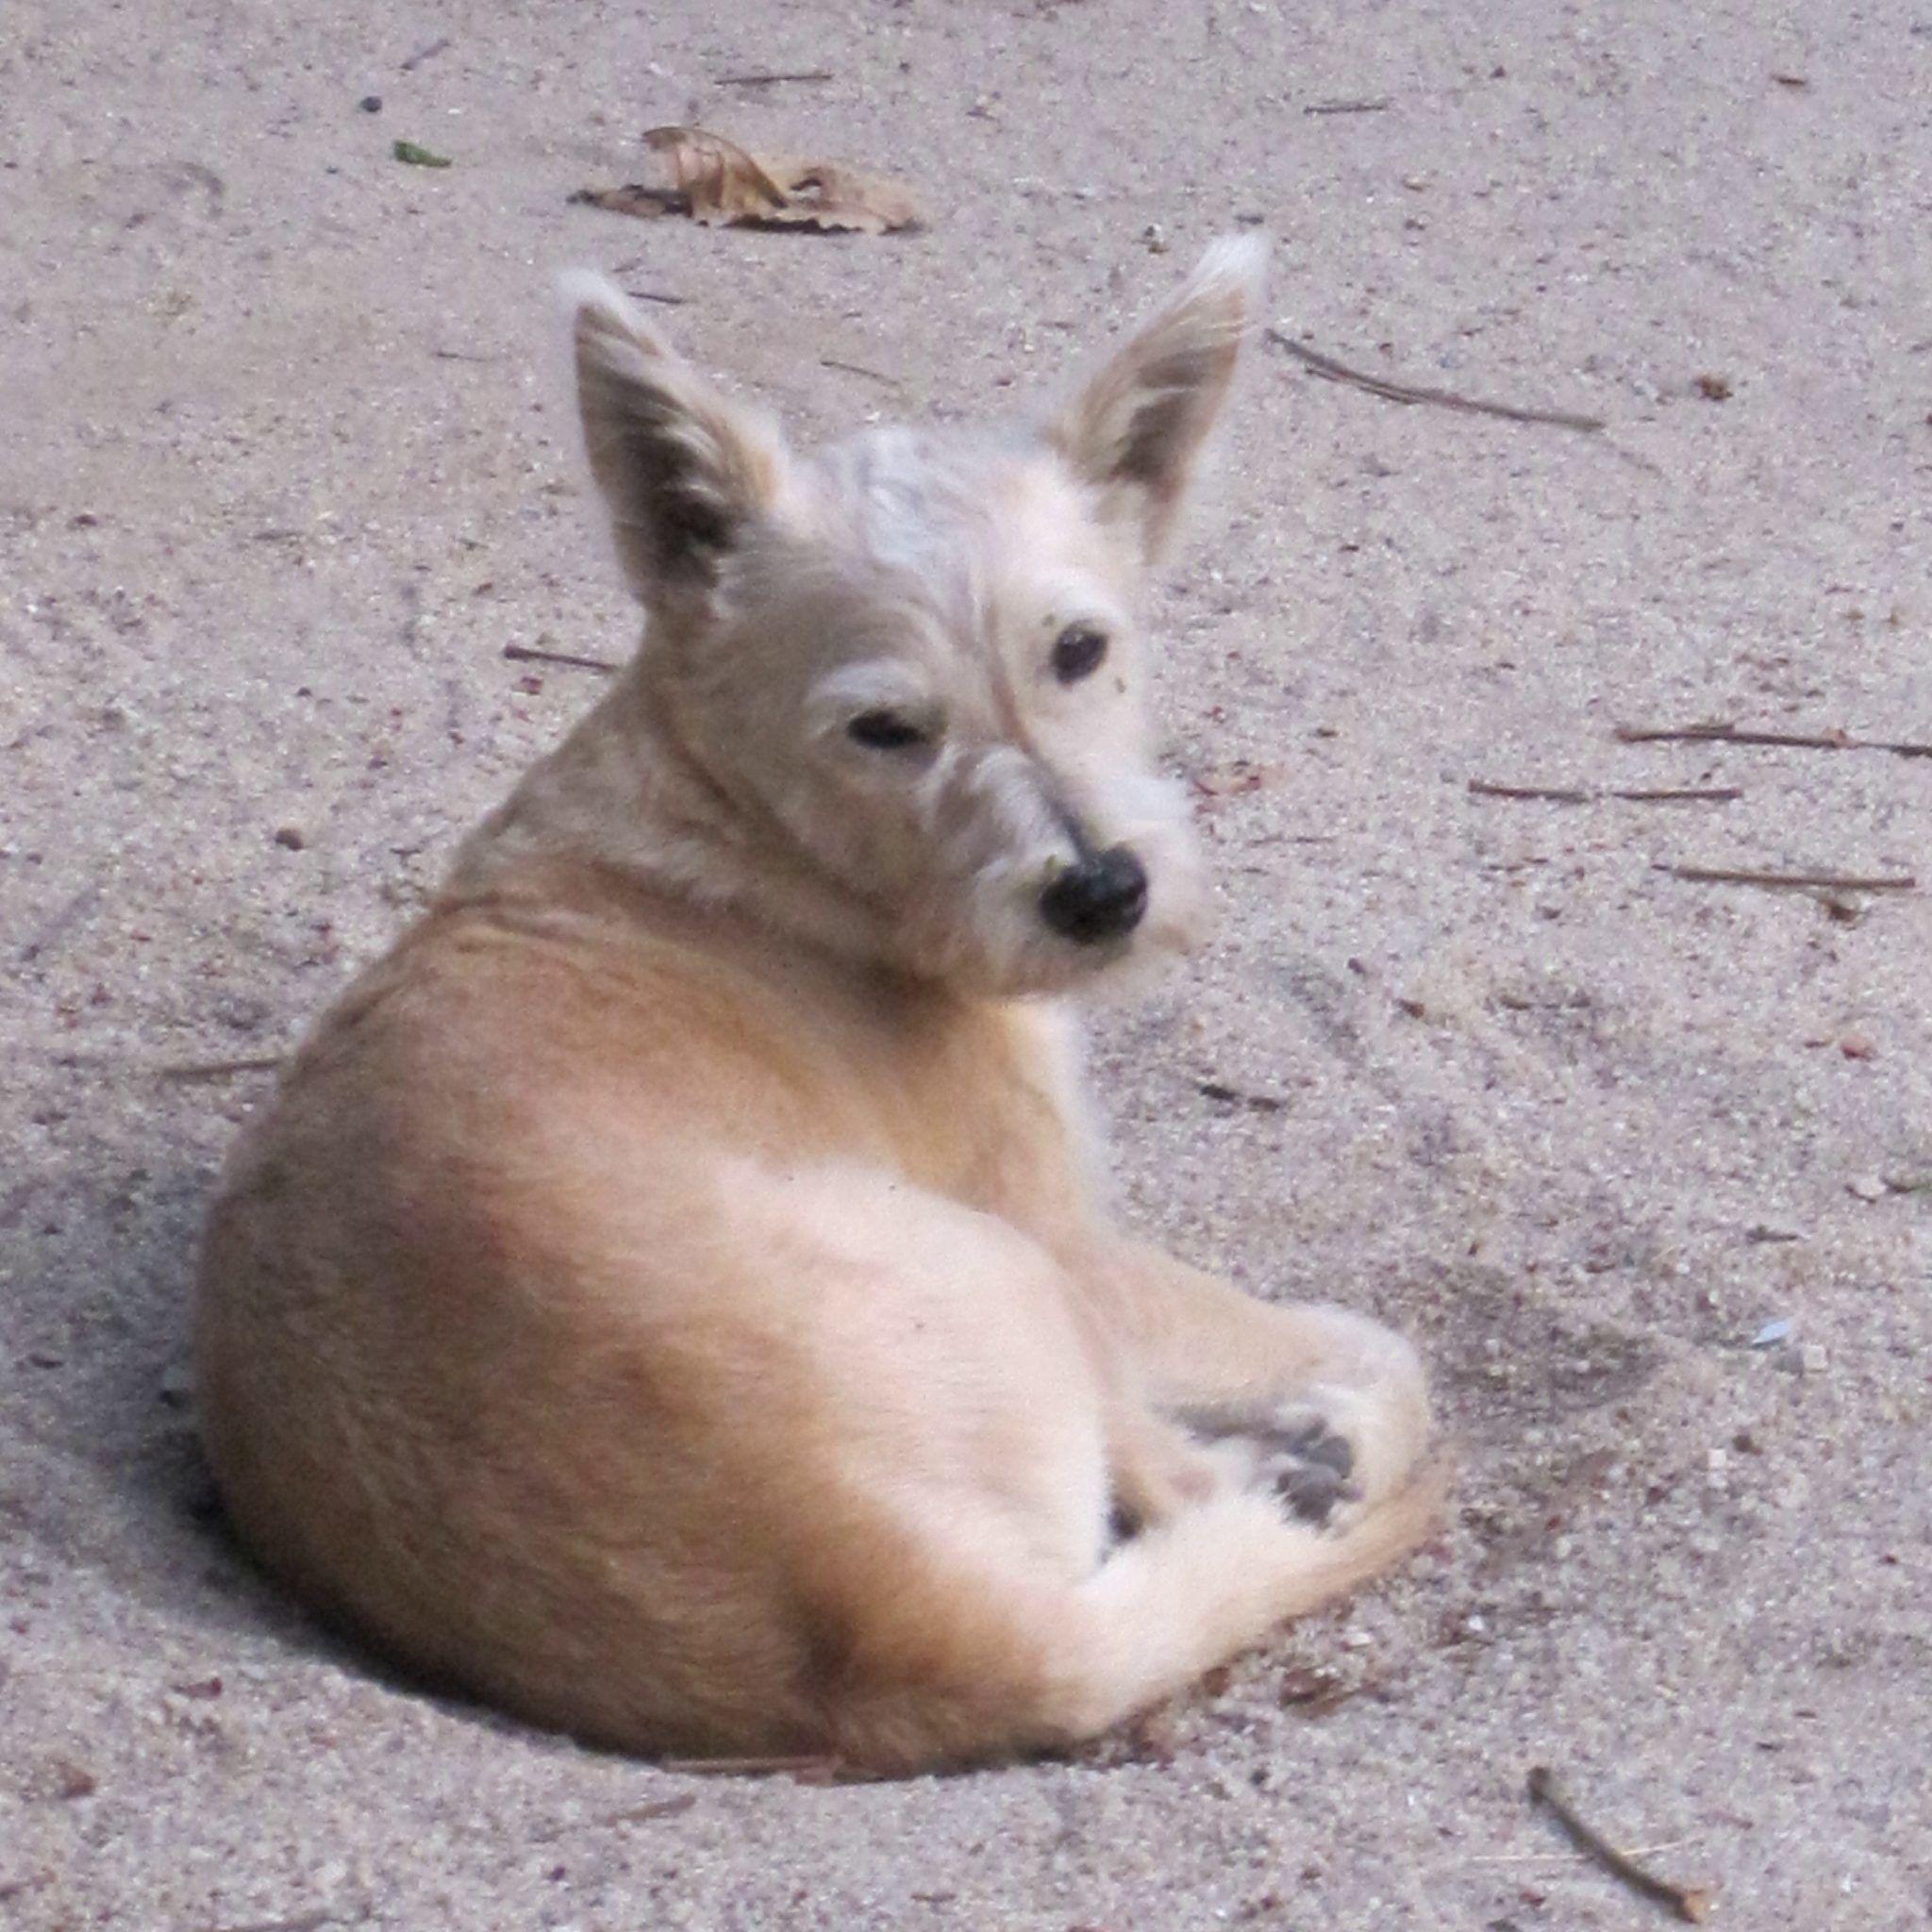 klosterhund buddhirefuge